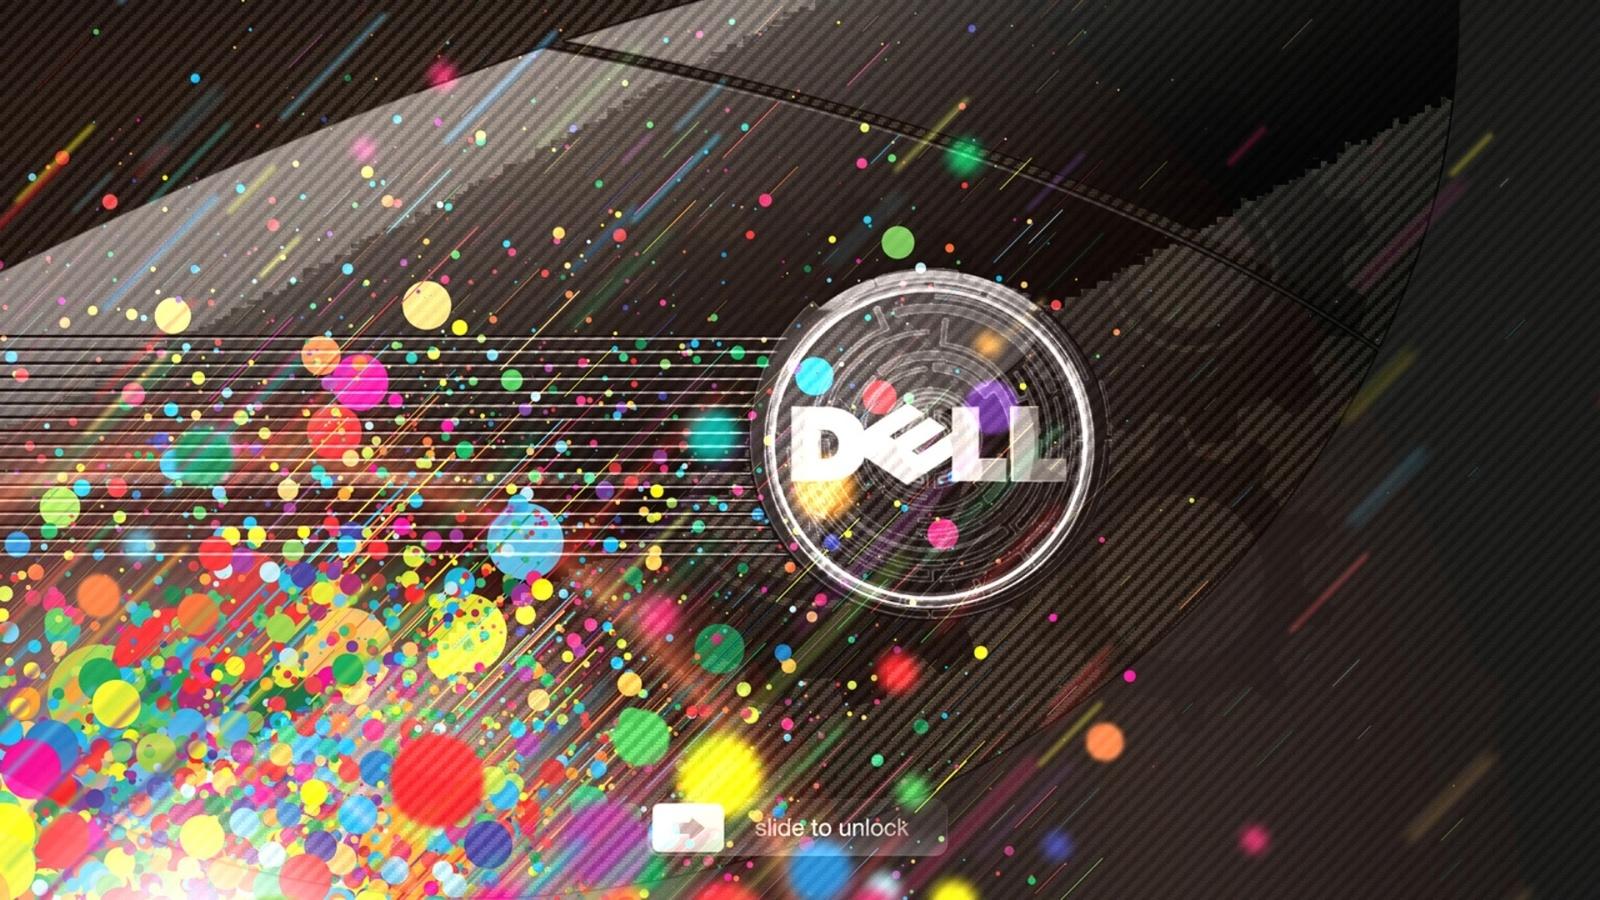 dell, цвета, круги, линии, шестерёнки, slide